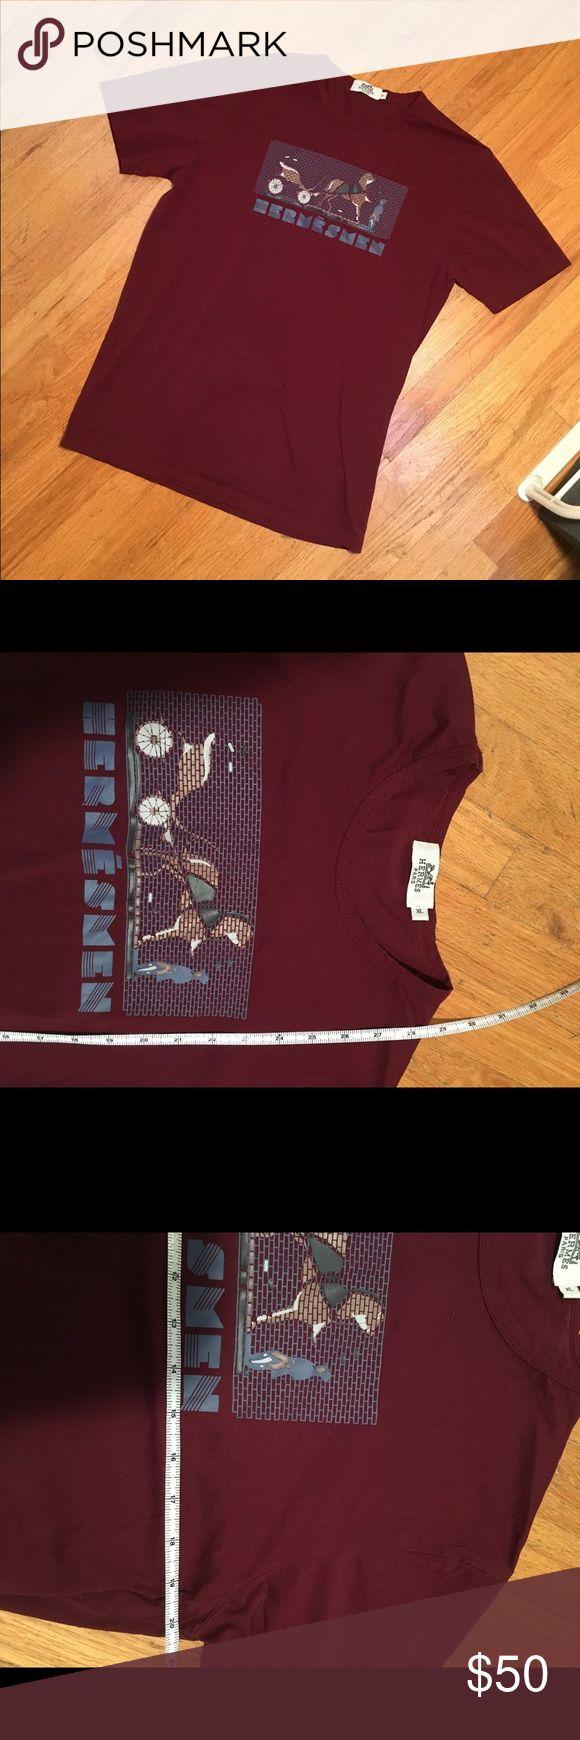 Hermes Men Burgundy Tee Like new. No stains, tears or pilling. Make an offer! Hermes Shirts Tees - Short Sleeve